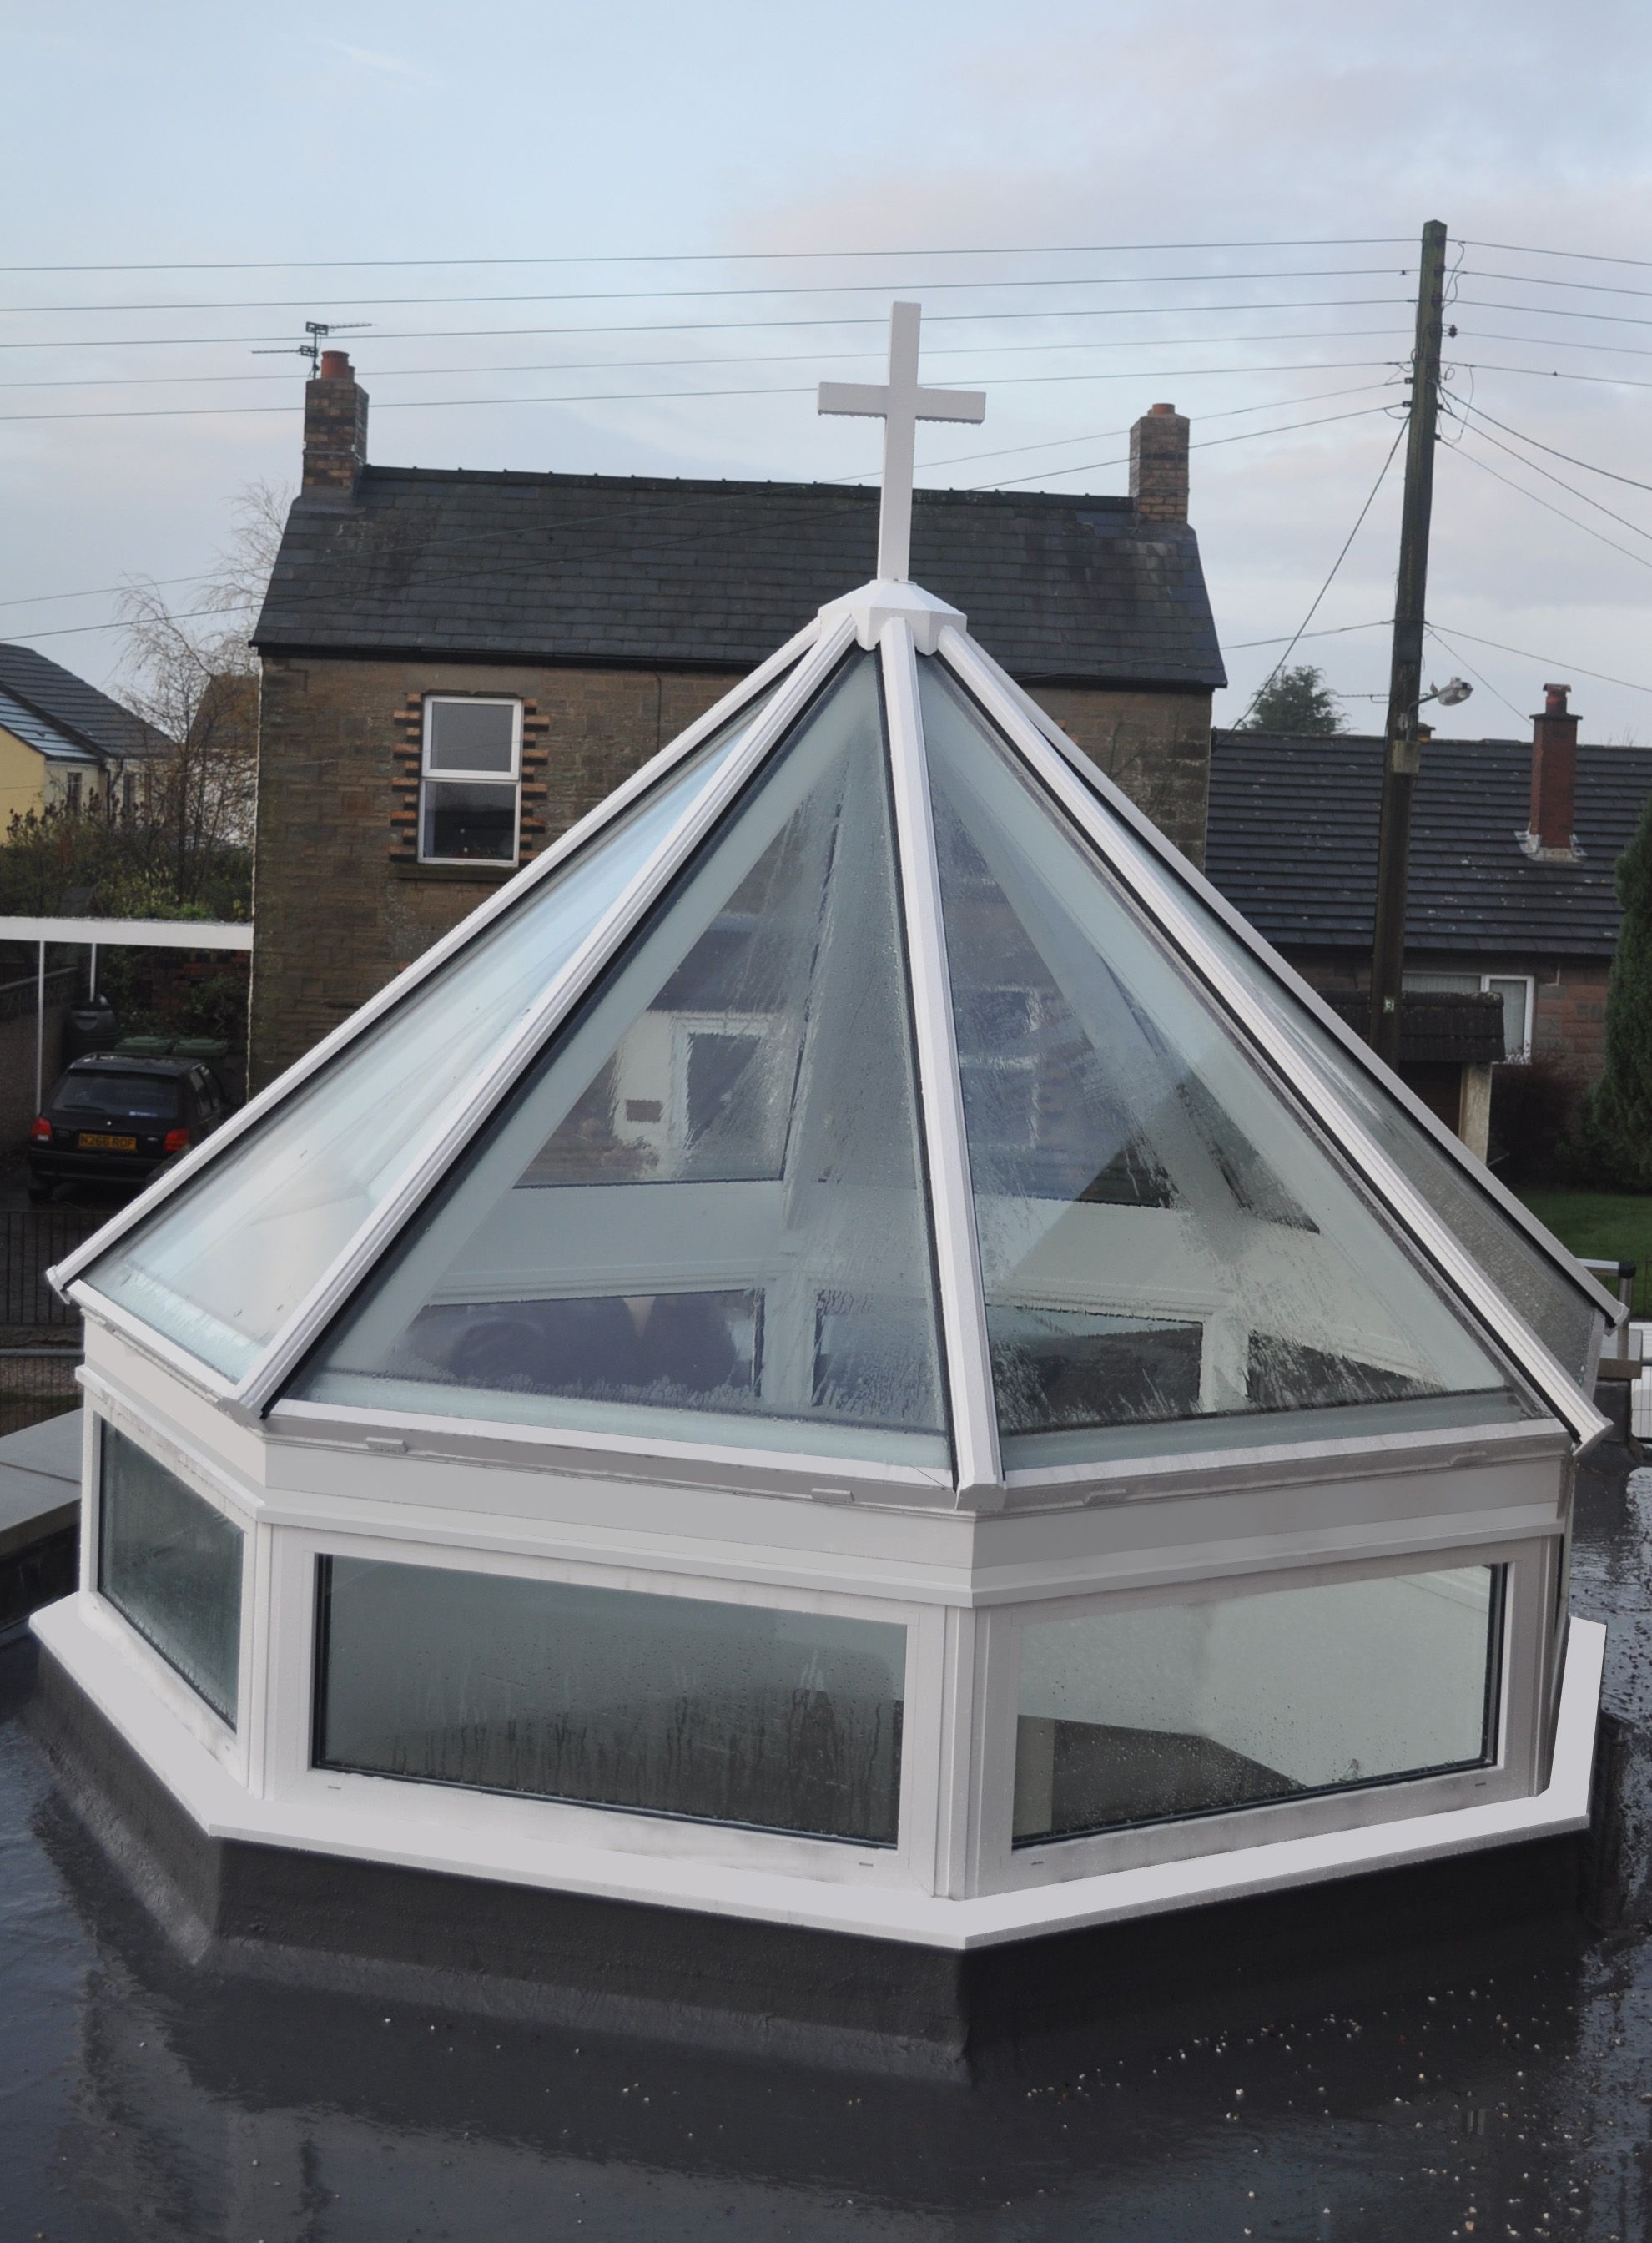 Www 4seasononline Co Uk Suppliers Of Bespoke Bifold Door Systems Rooflights Roof Lanterns And Skylights Roof Lantern Roof Light Skylight